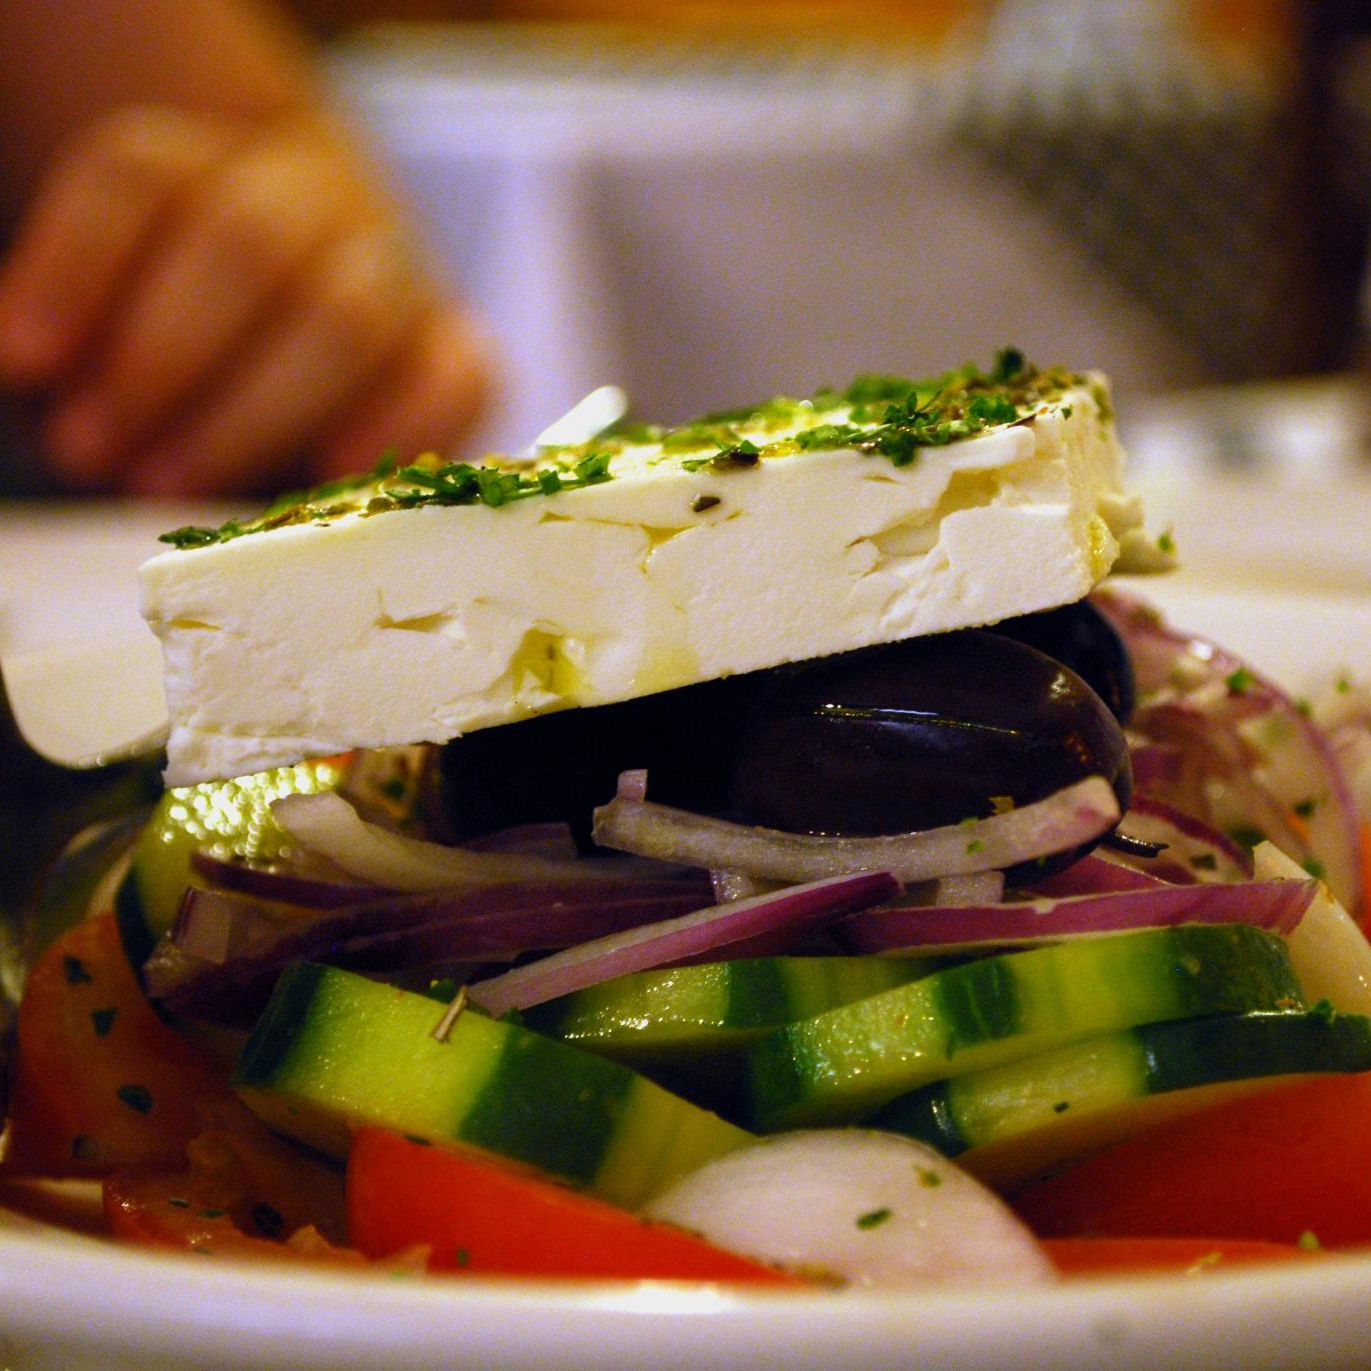 Eat Your Way Through Europe